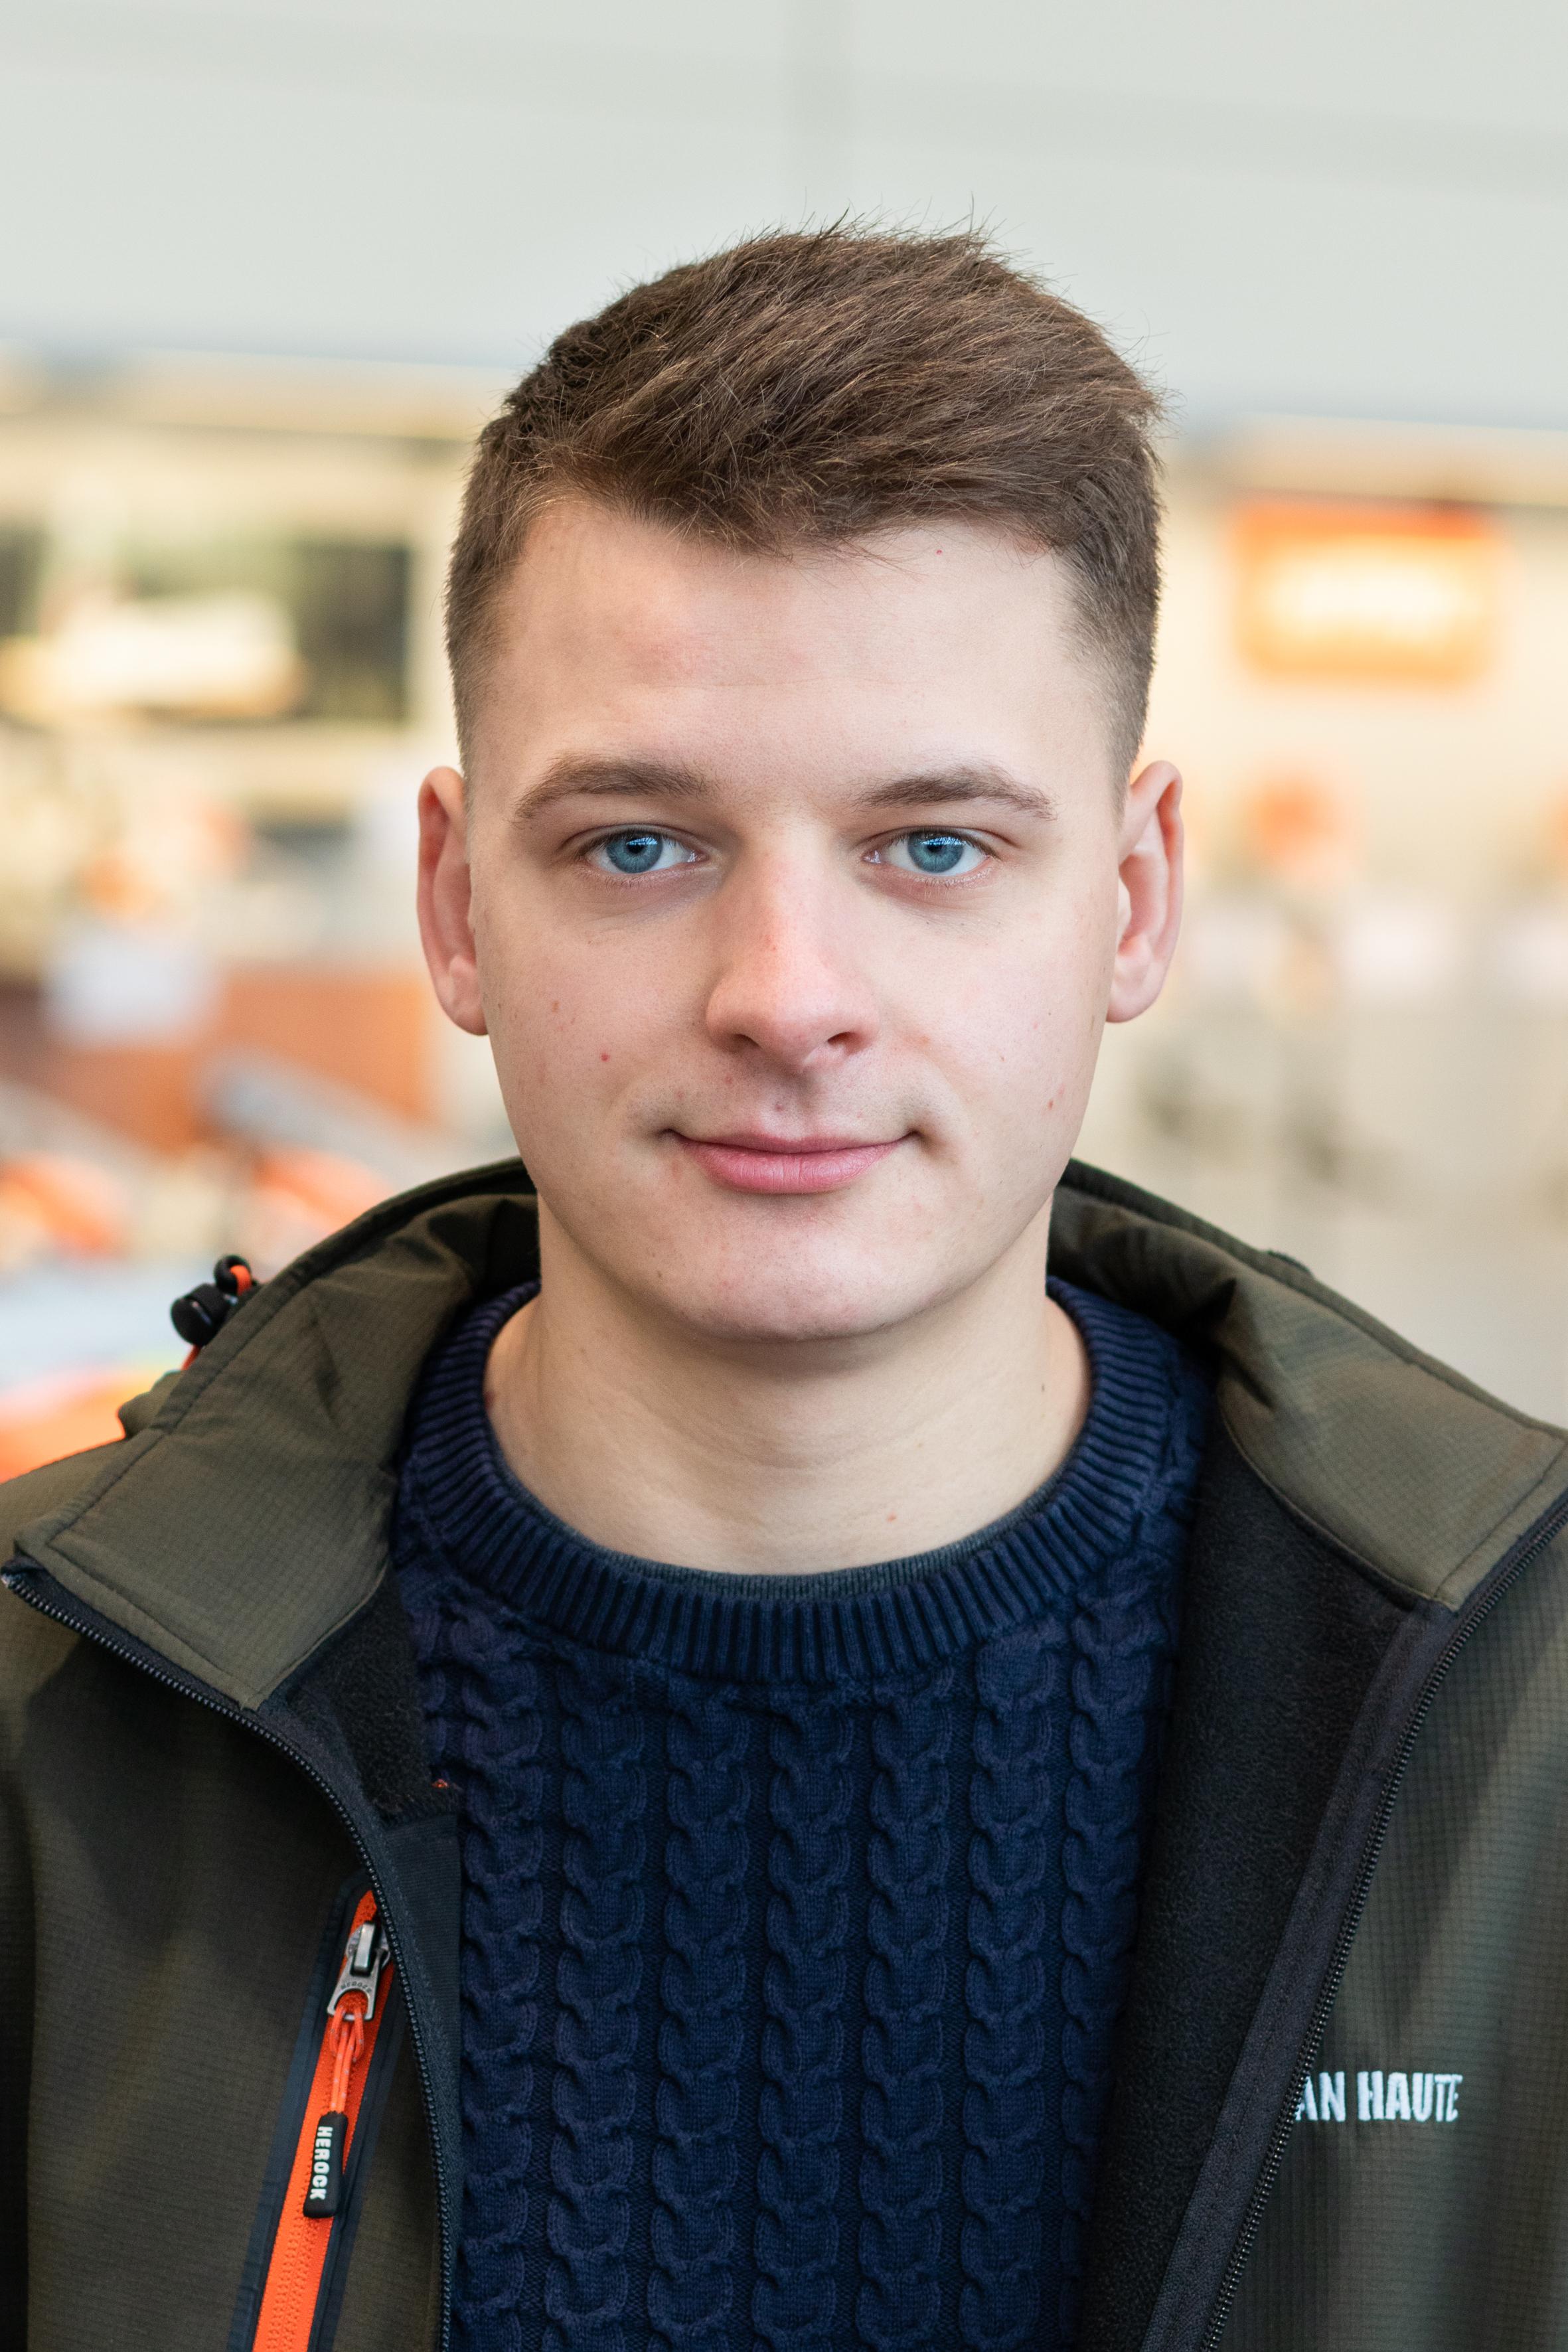 Cédric Bouckaert